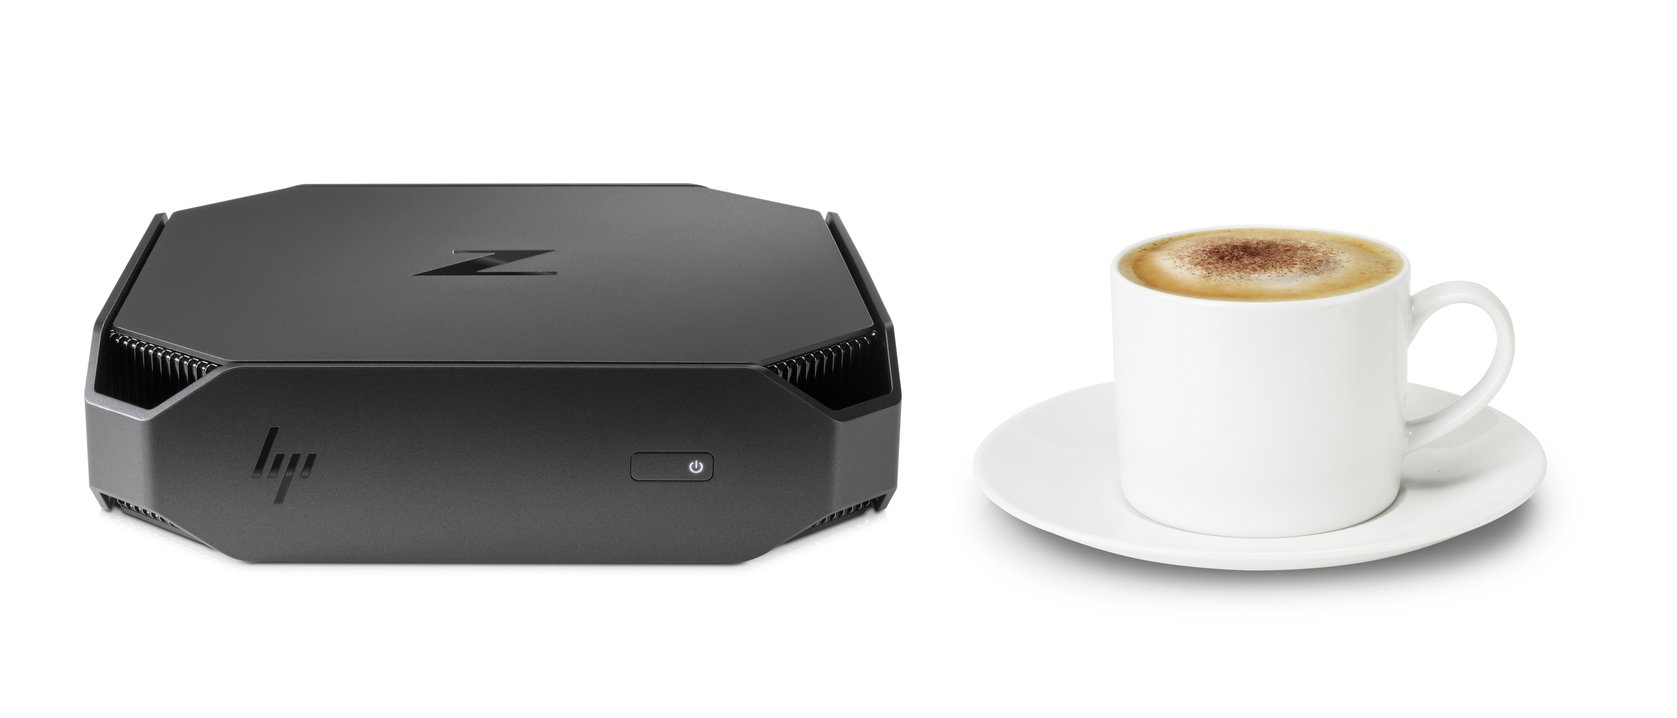 Winzige Workstation mit Intel Xeon und Nvidia Quadro